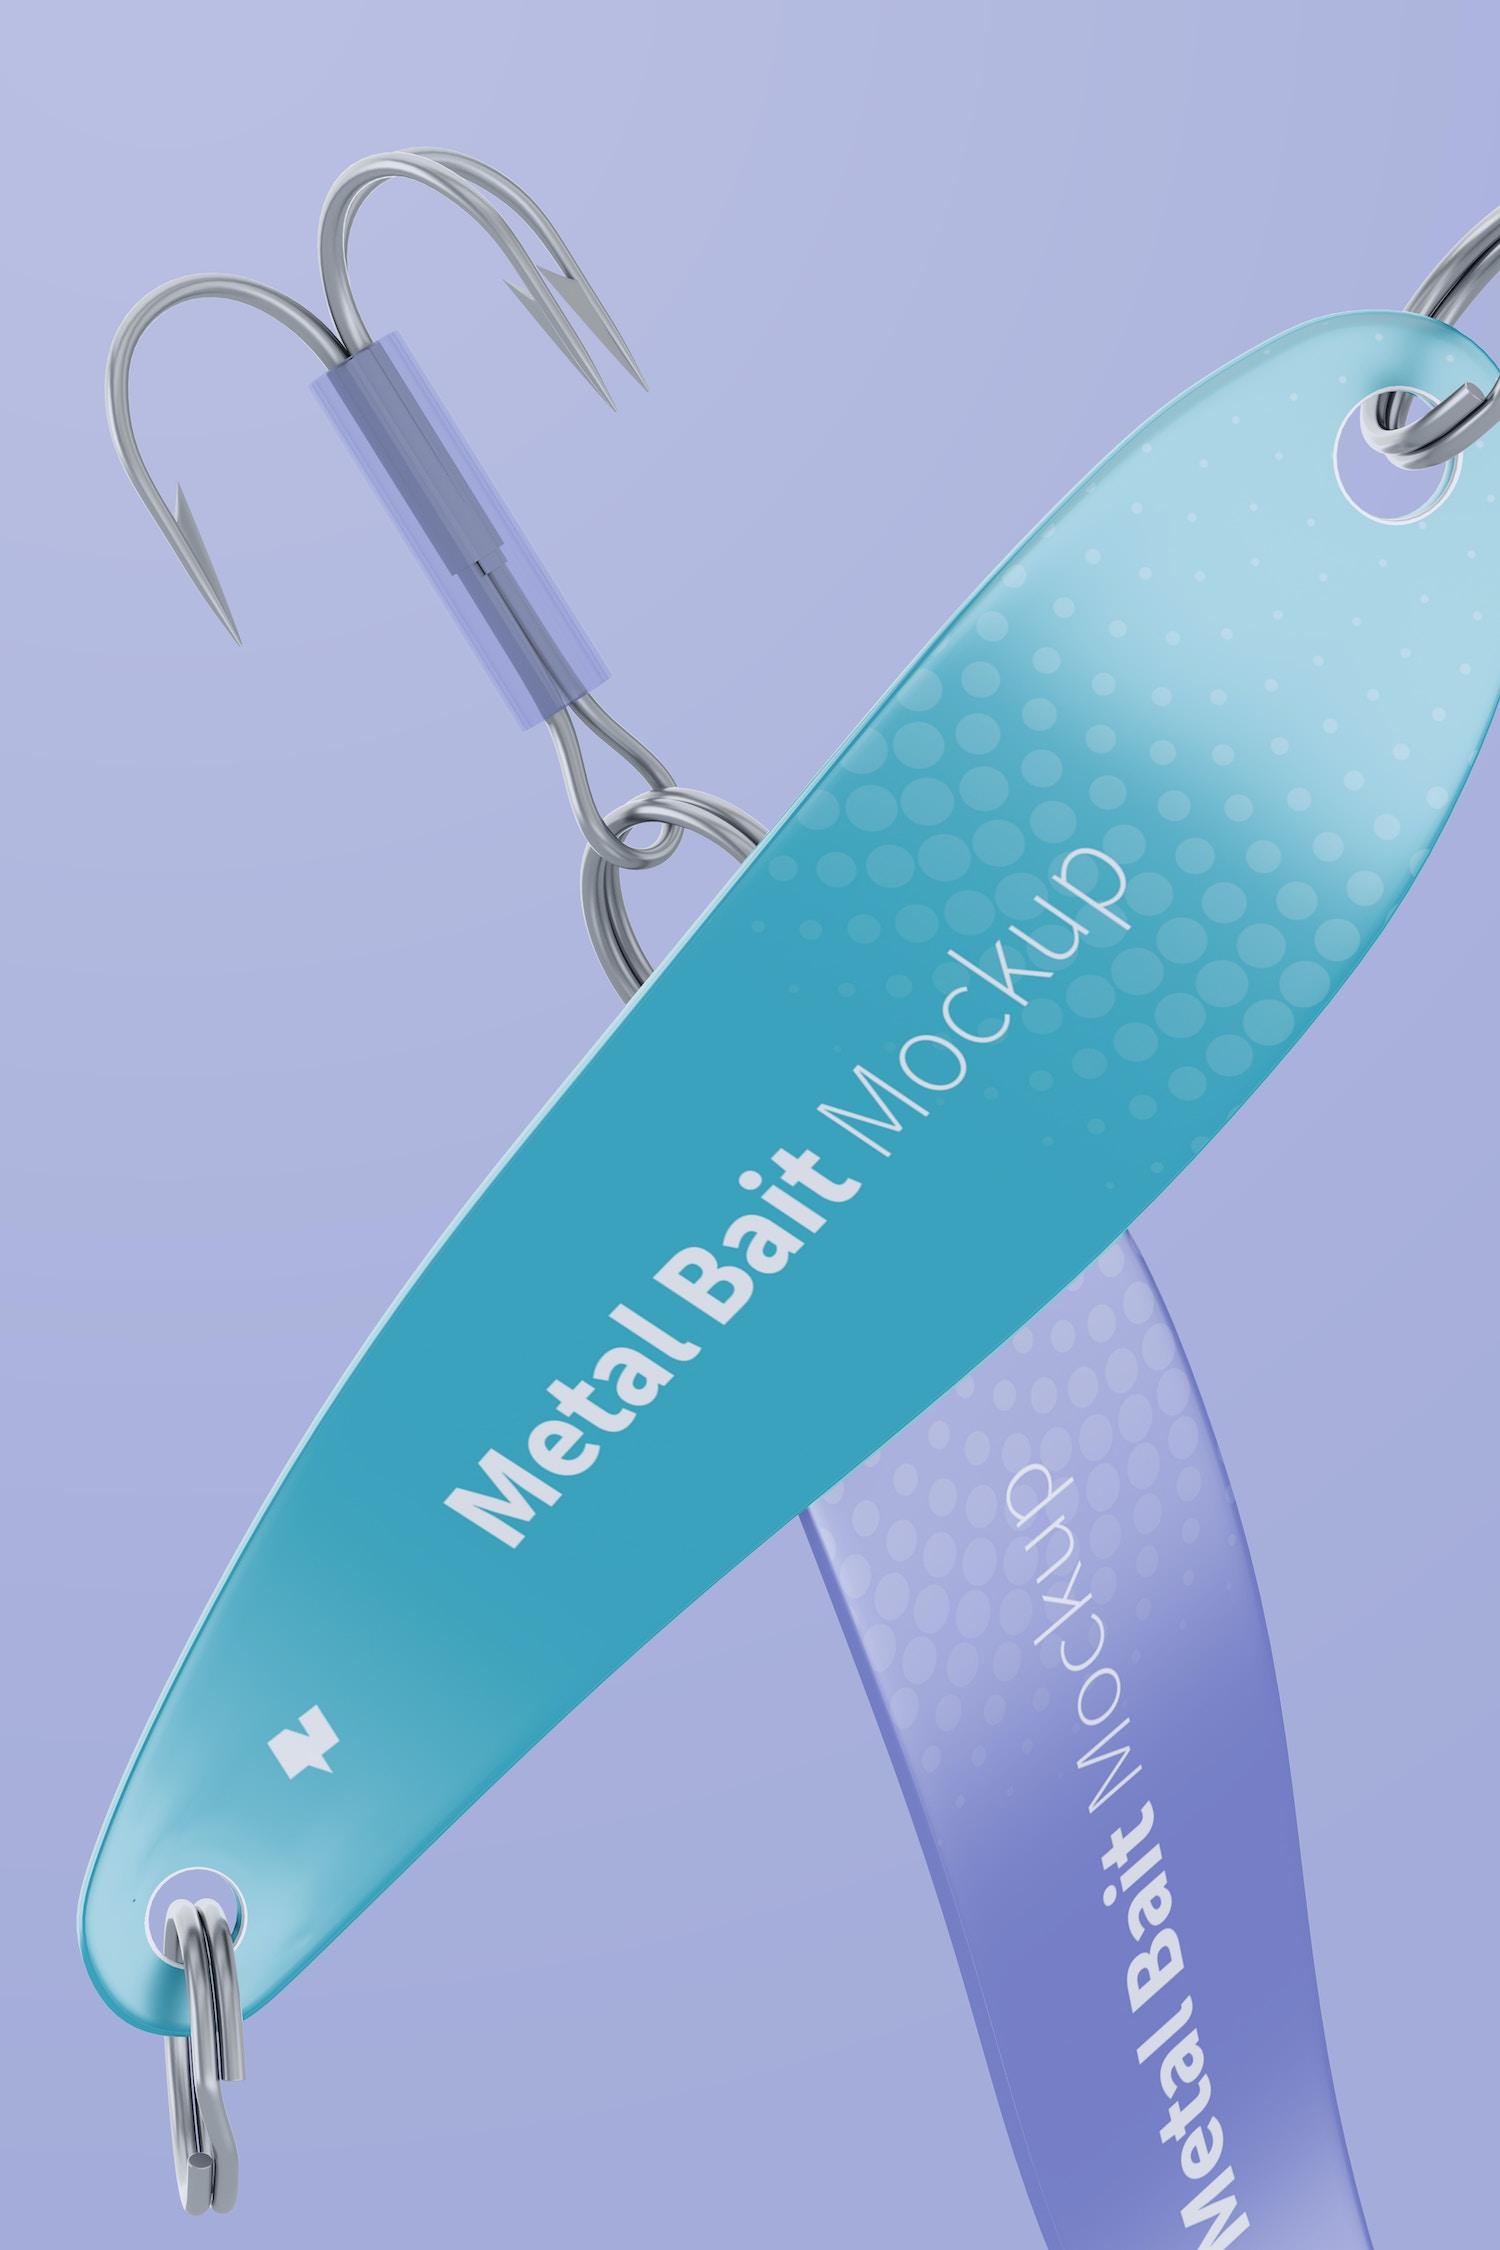 Metal Spoon Baits Mockup, Close Up